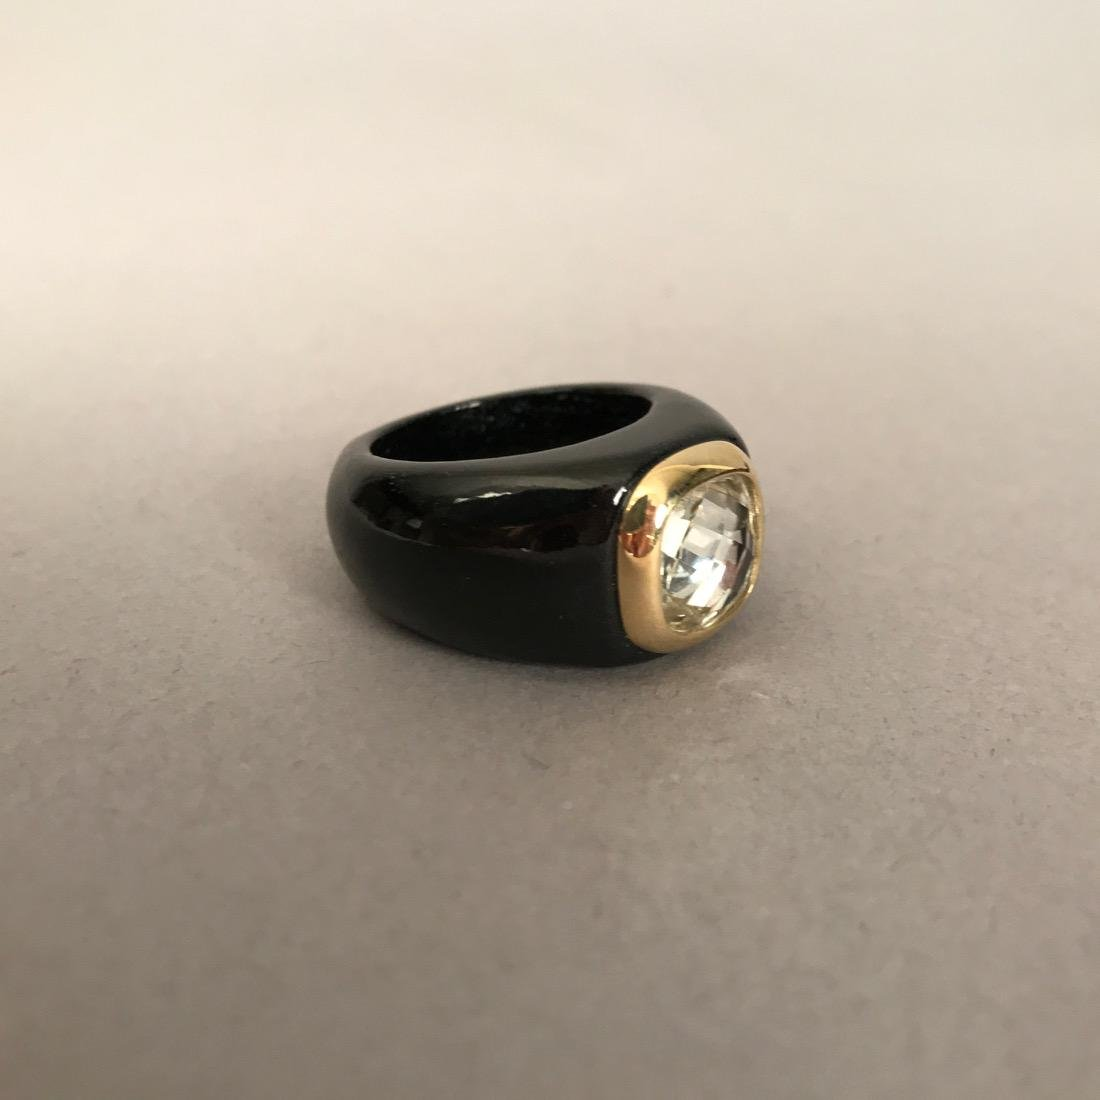 Carved Onyx Ring w Prasiolite in 14K Gold Bezel - 2